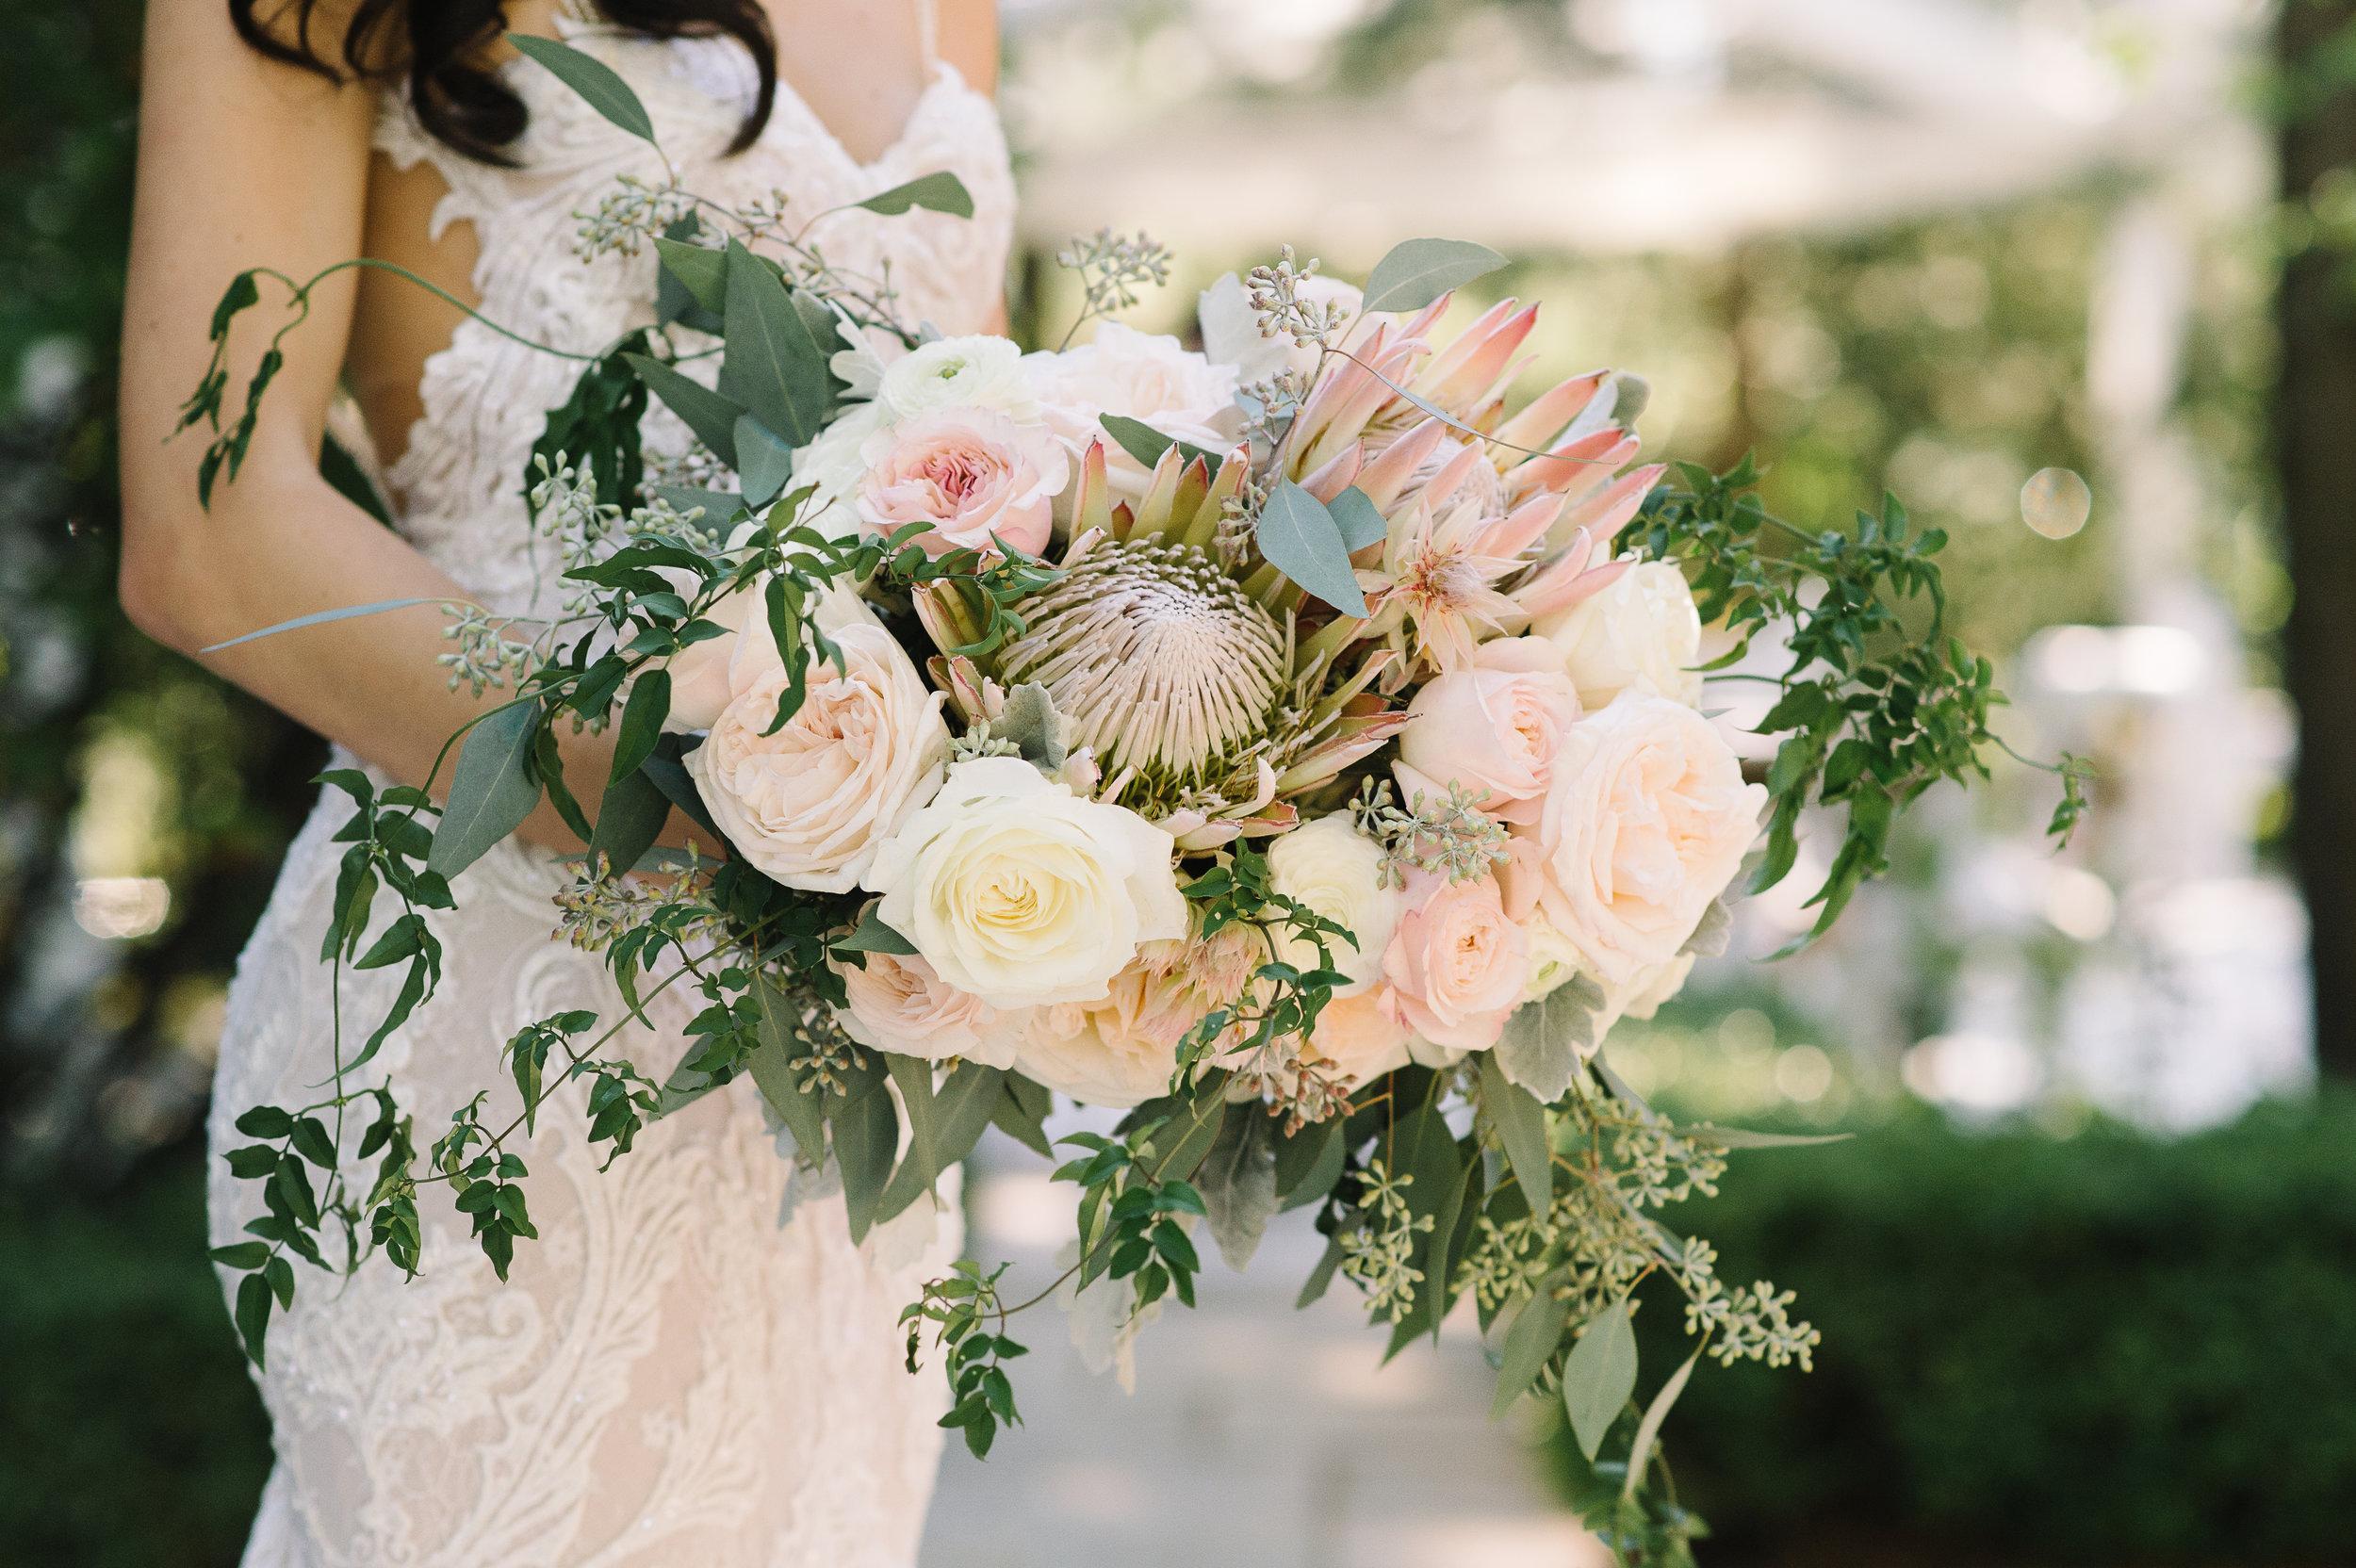 Vanessa's Bouquet.jpg